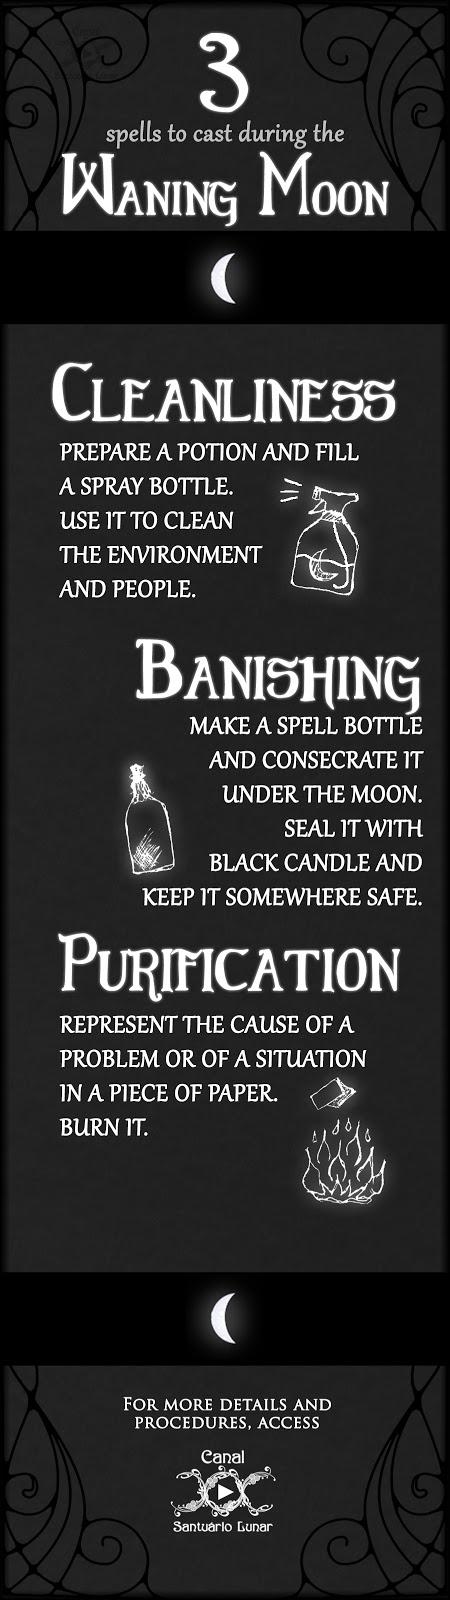 Wiccan Waning Moon Spells: Clean | Banish | Purificate (+1 Calendar)